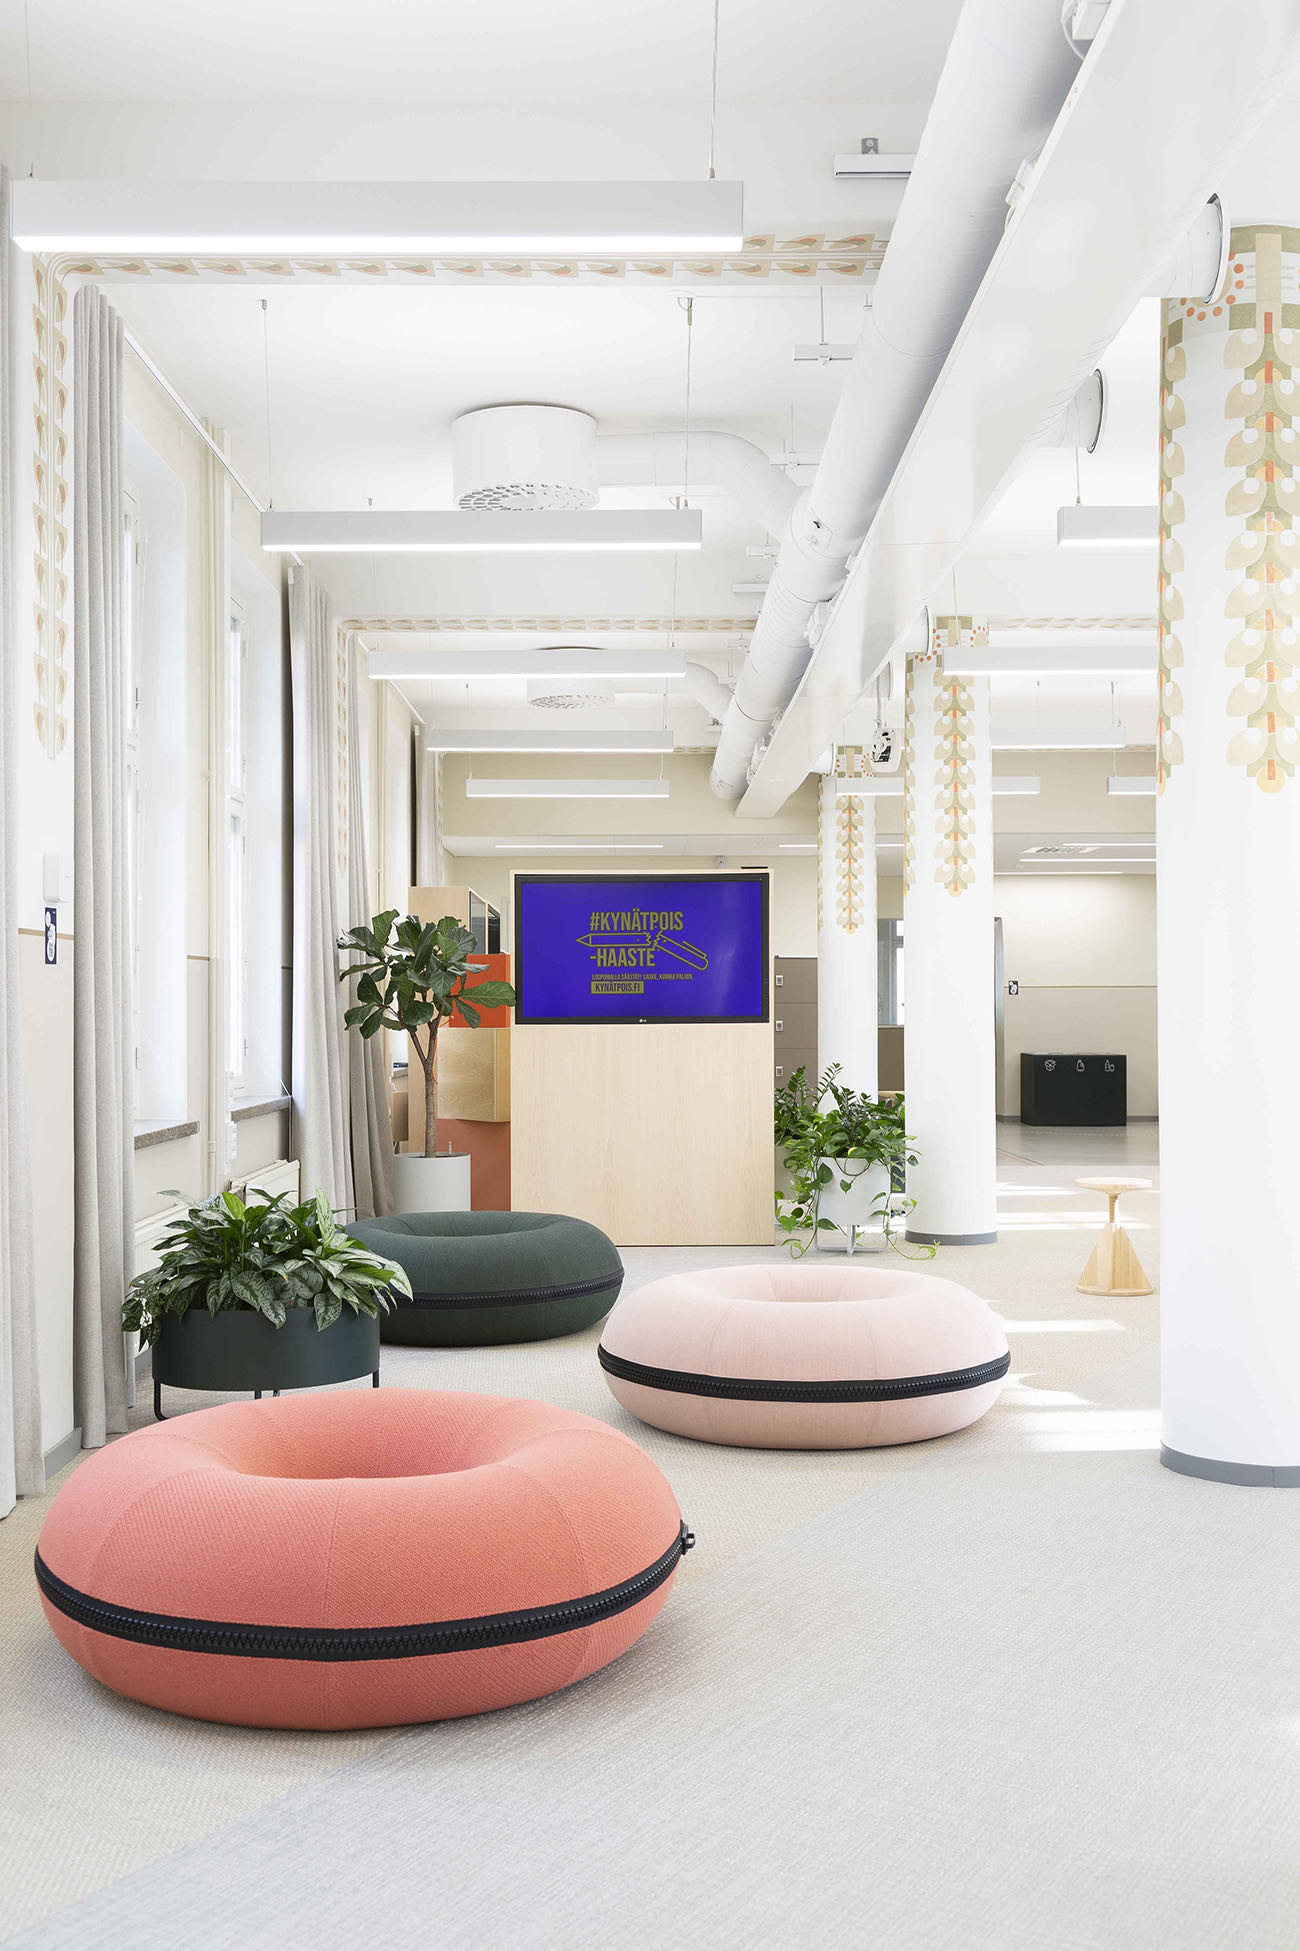 A Look Inside Urban3's Cool New Coworking Space In Helsinki